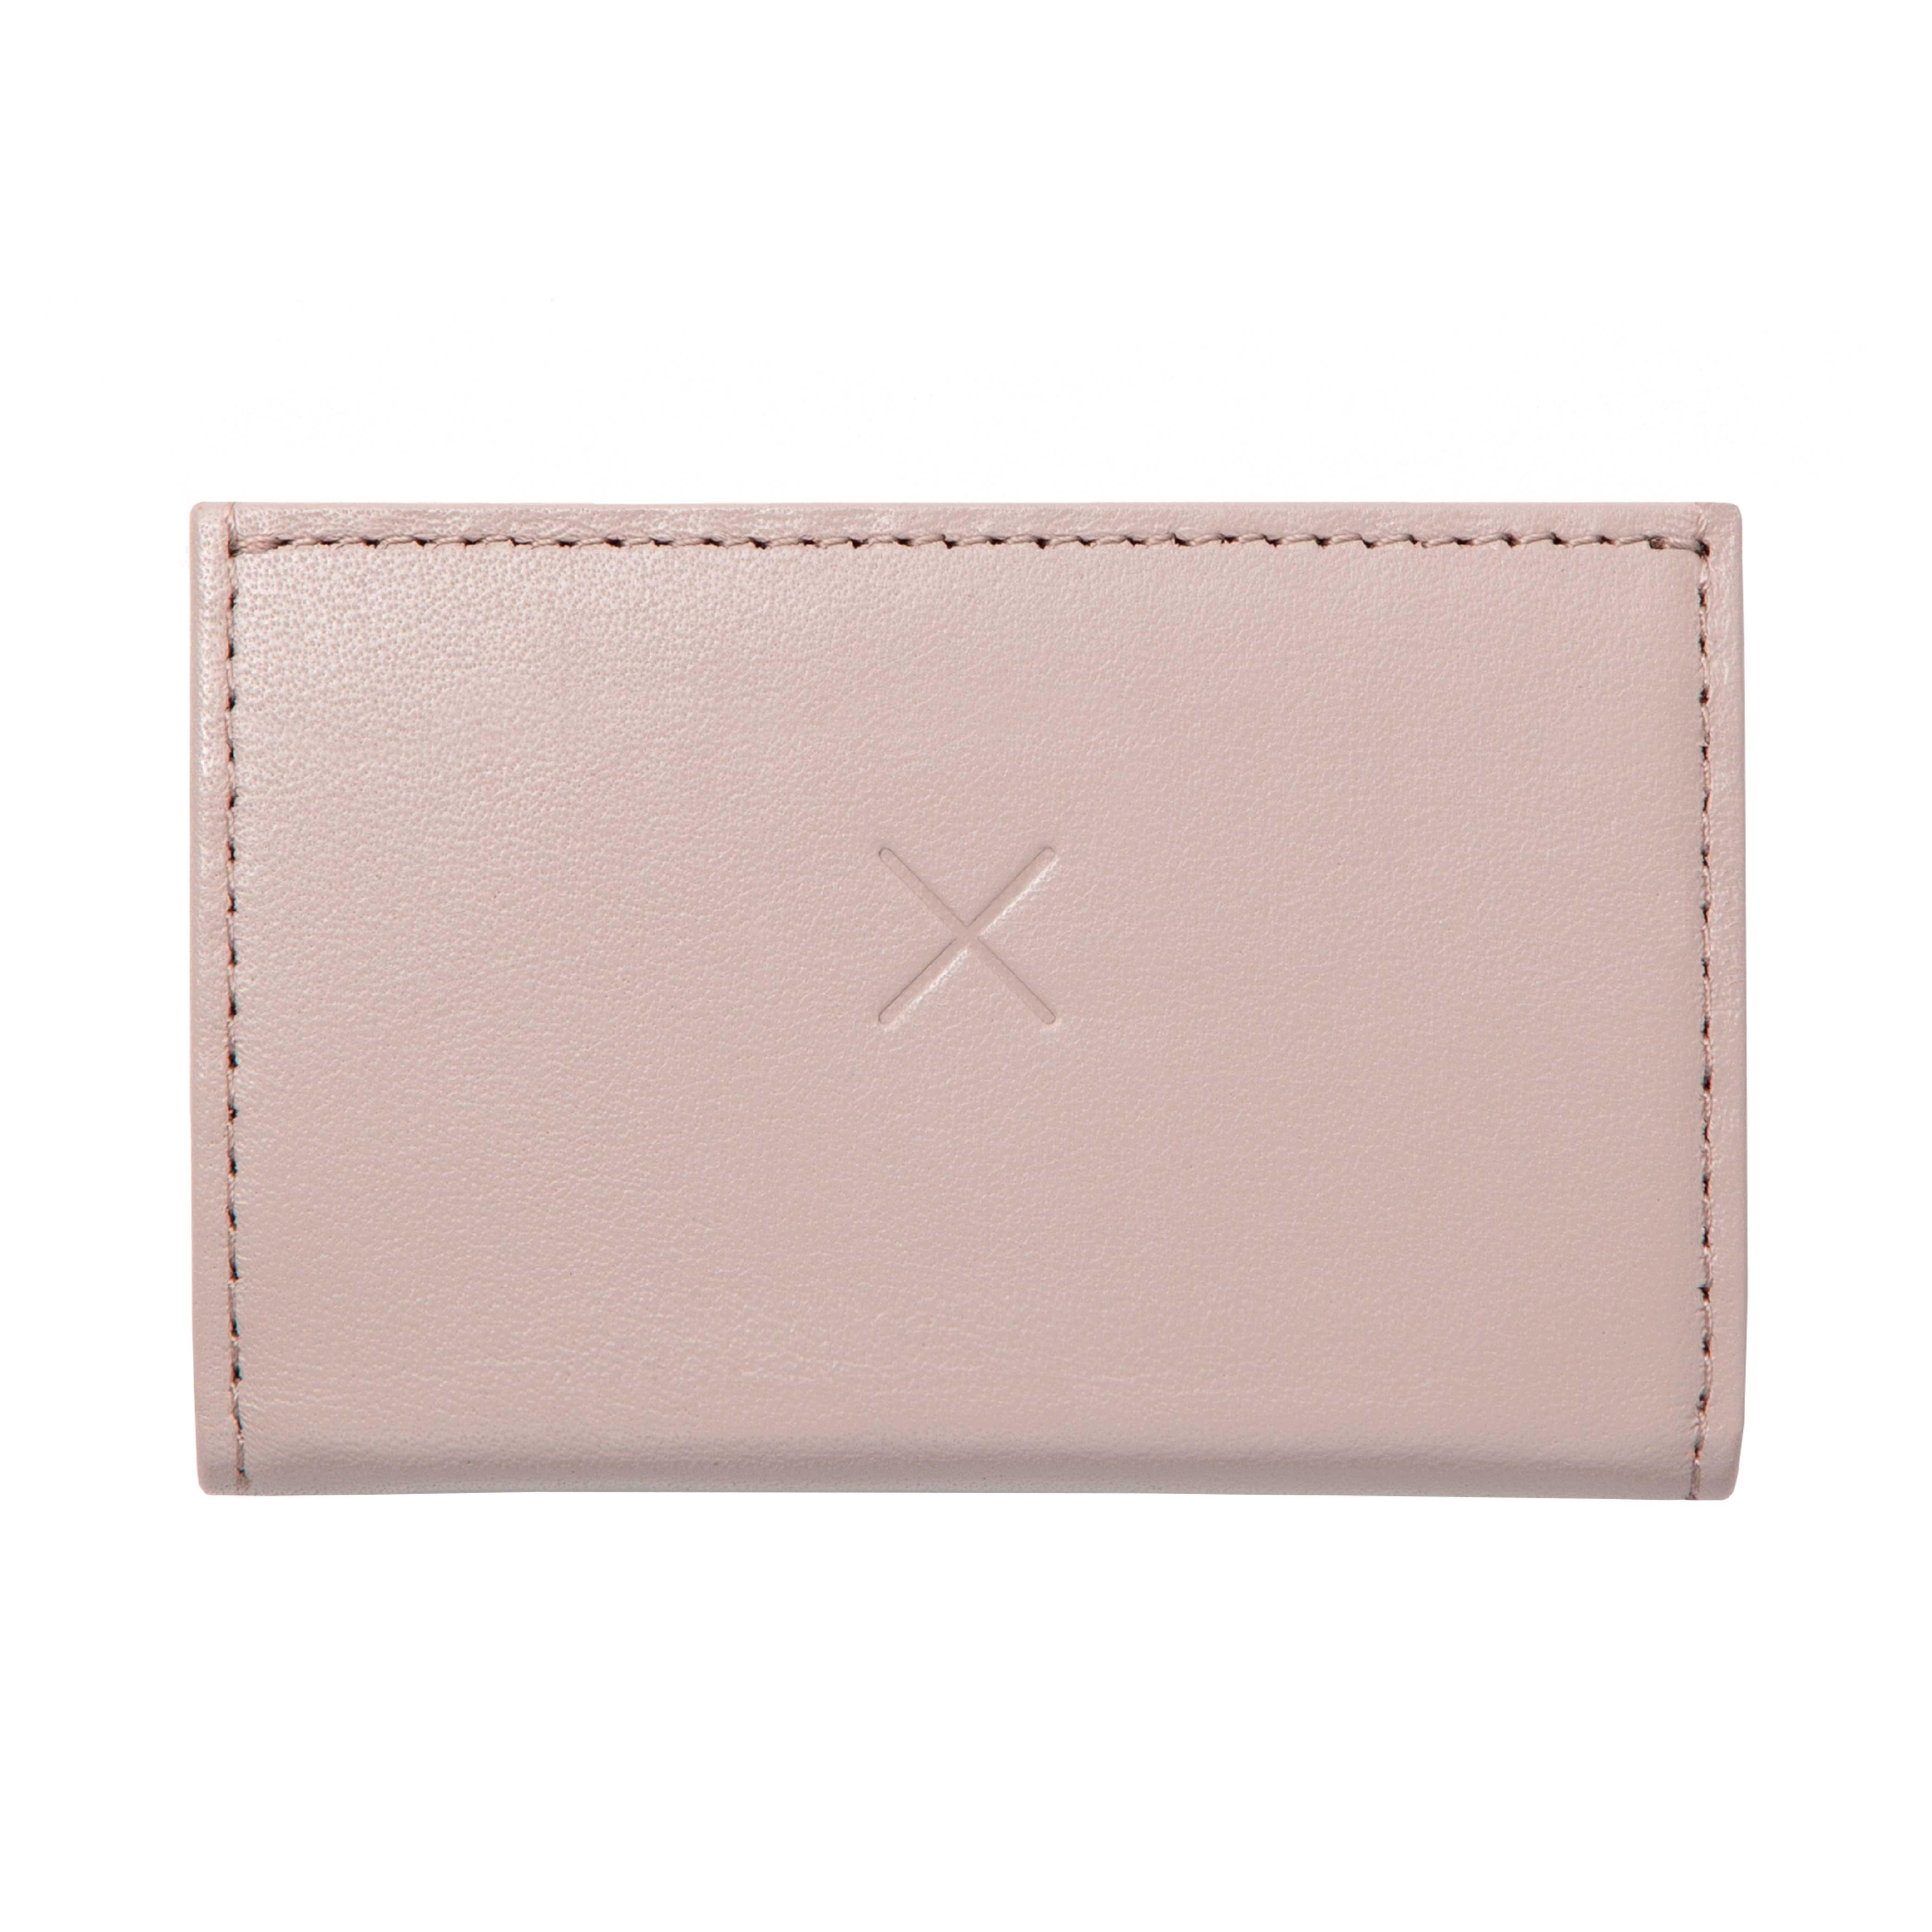 4yinnyrot6 supr good co slim 2 wallet 0 original